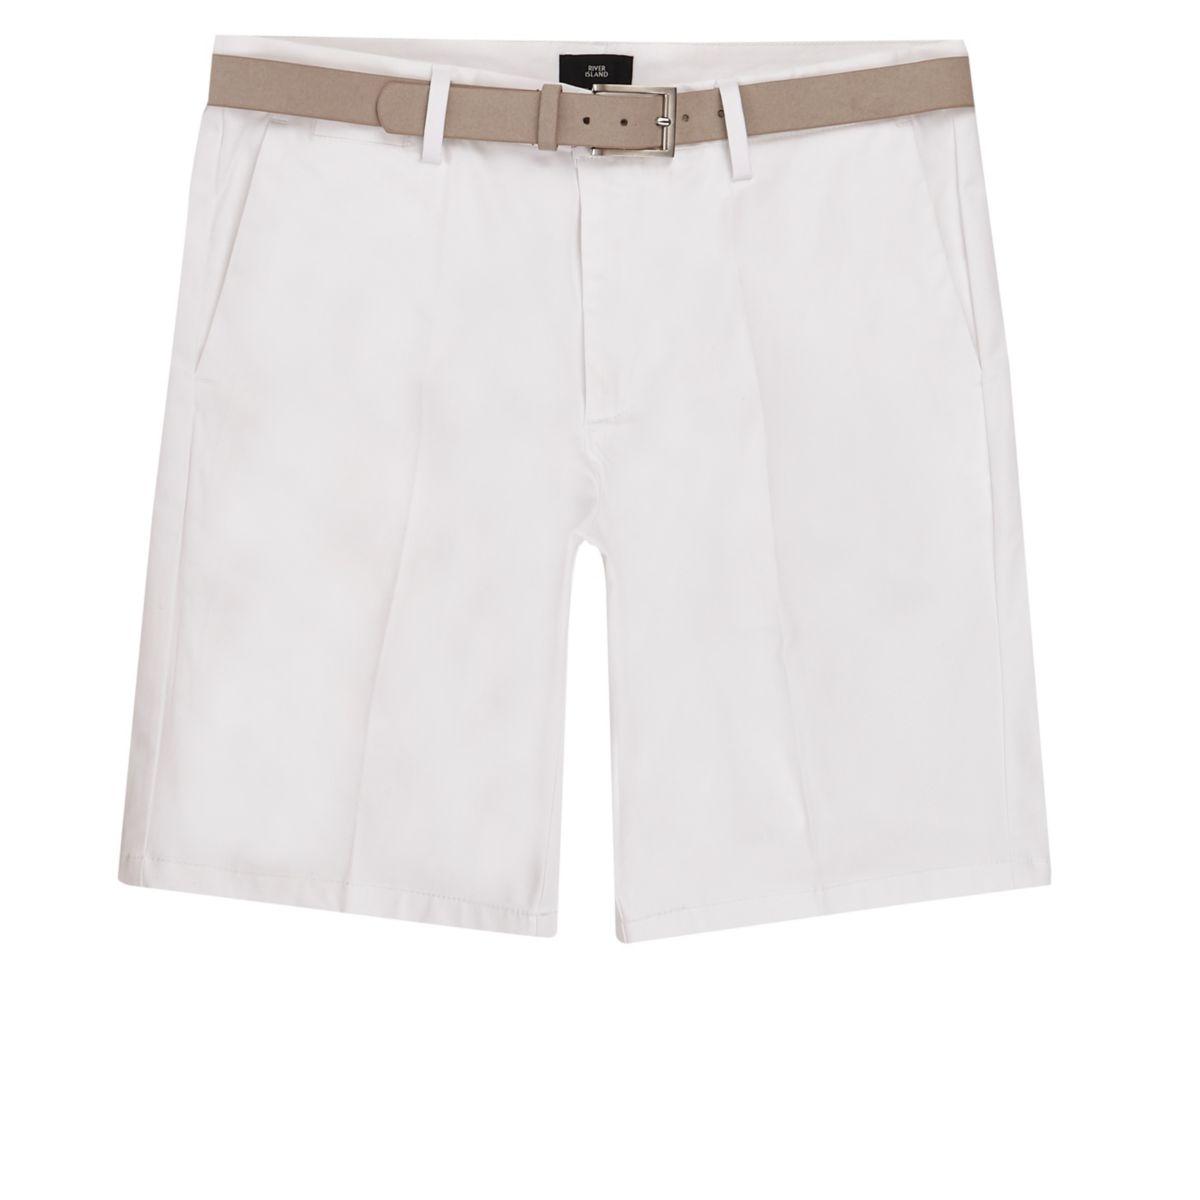 White belted chino shorts